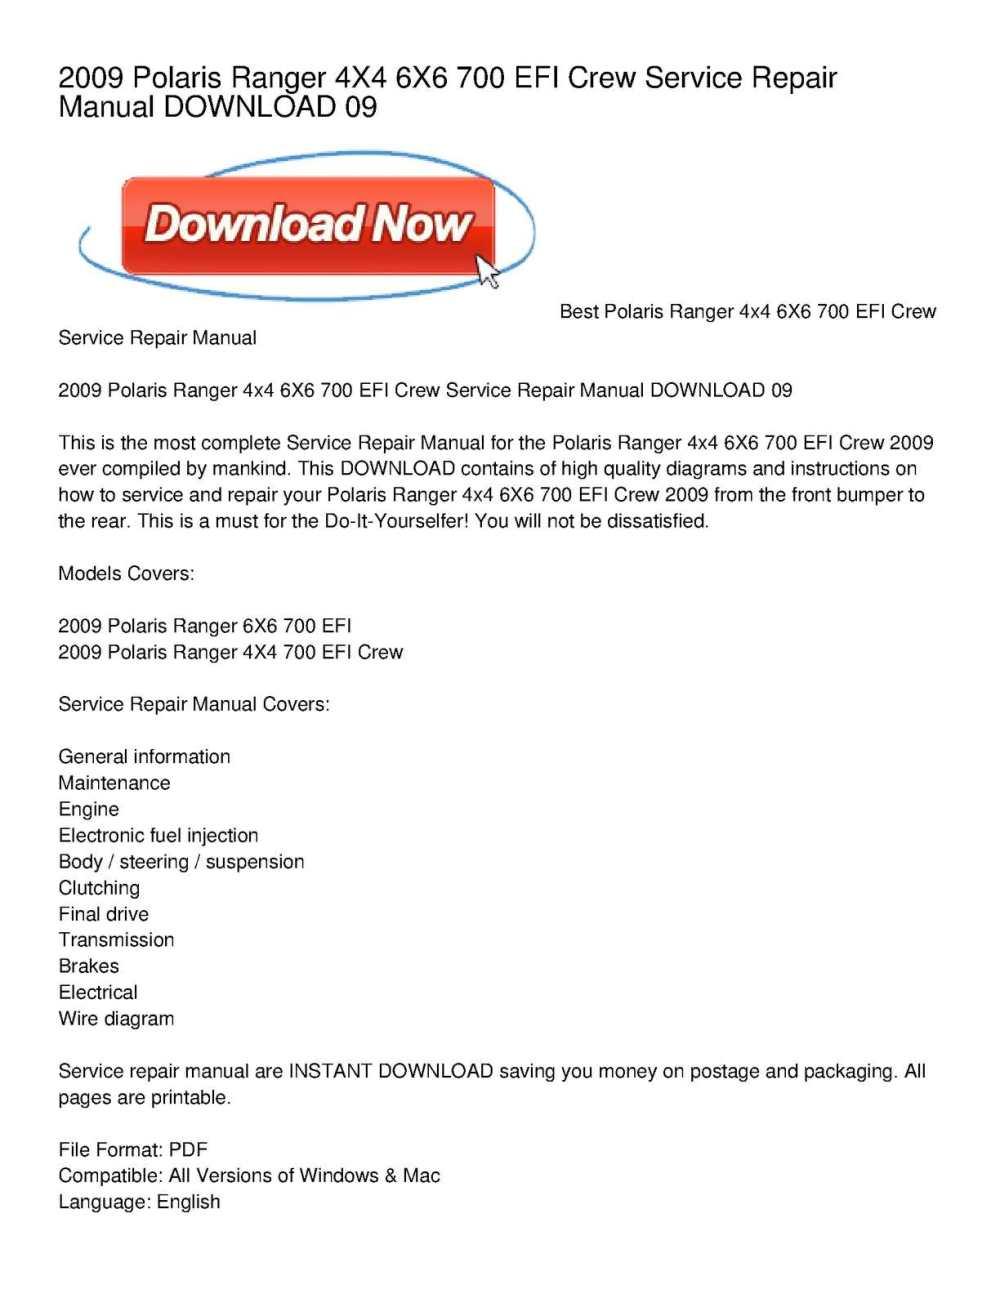 medium resolution of calam o 2009 polaris ranger 4x4 6x6 700 efi crew service repair manual download 09